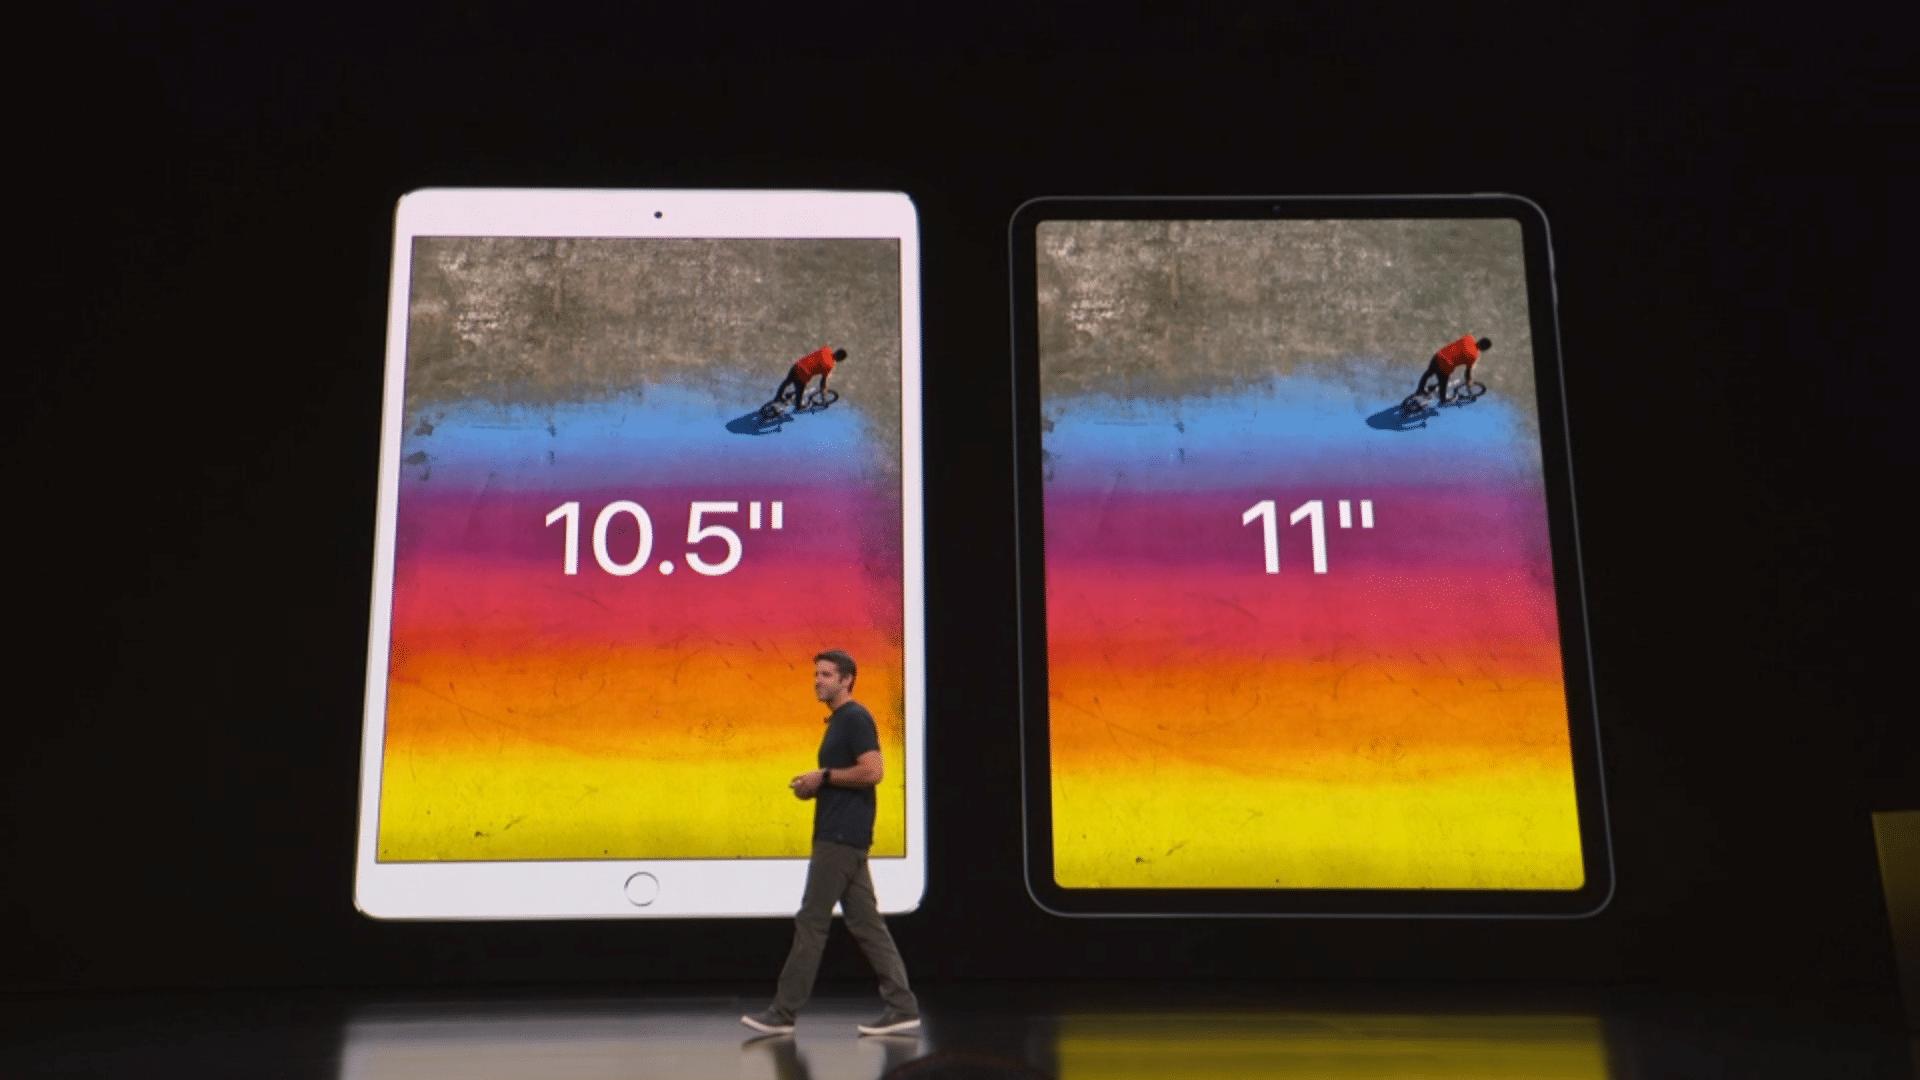 كل ماتريد معرفته عن iPad Pro 2018 5